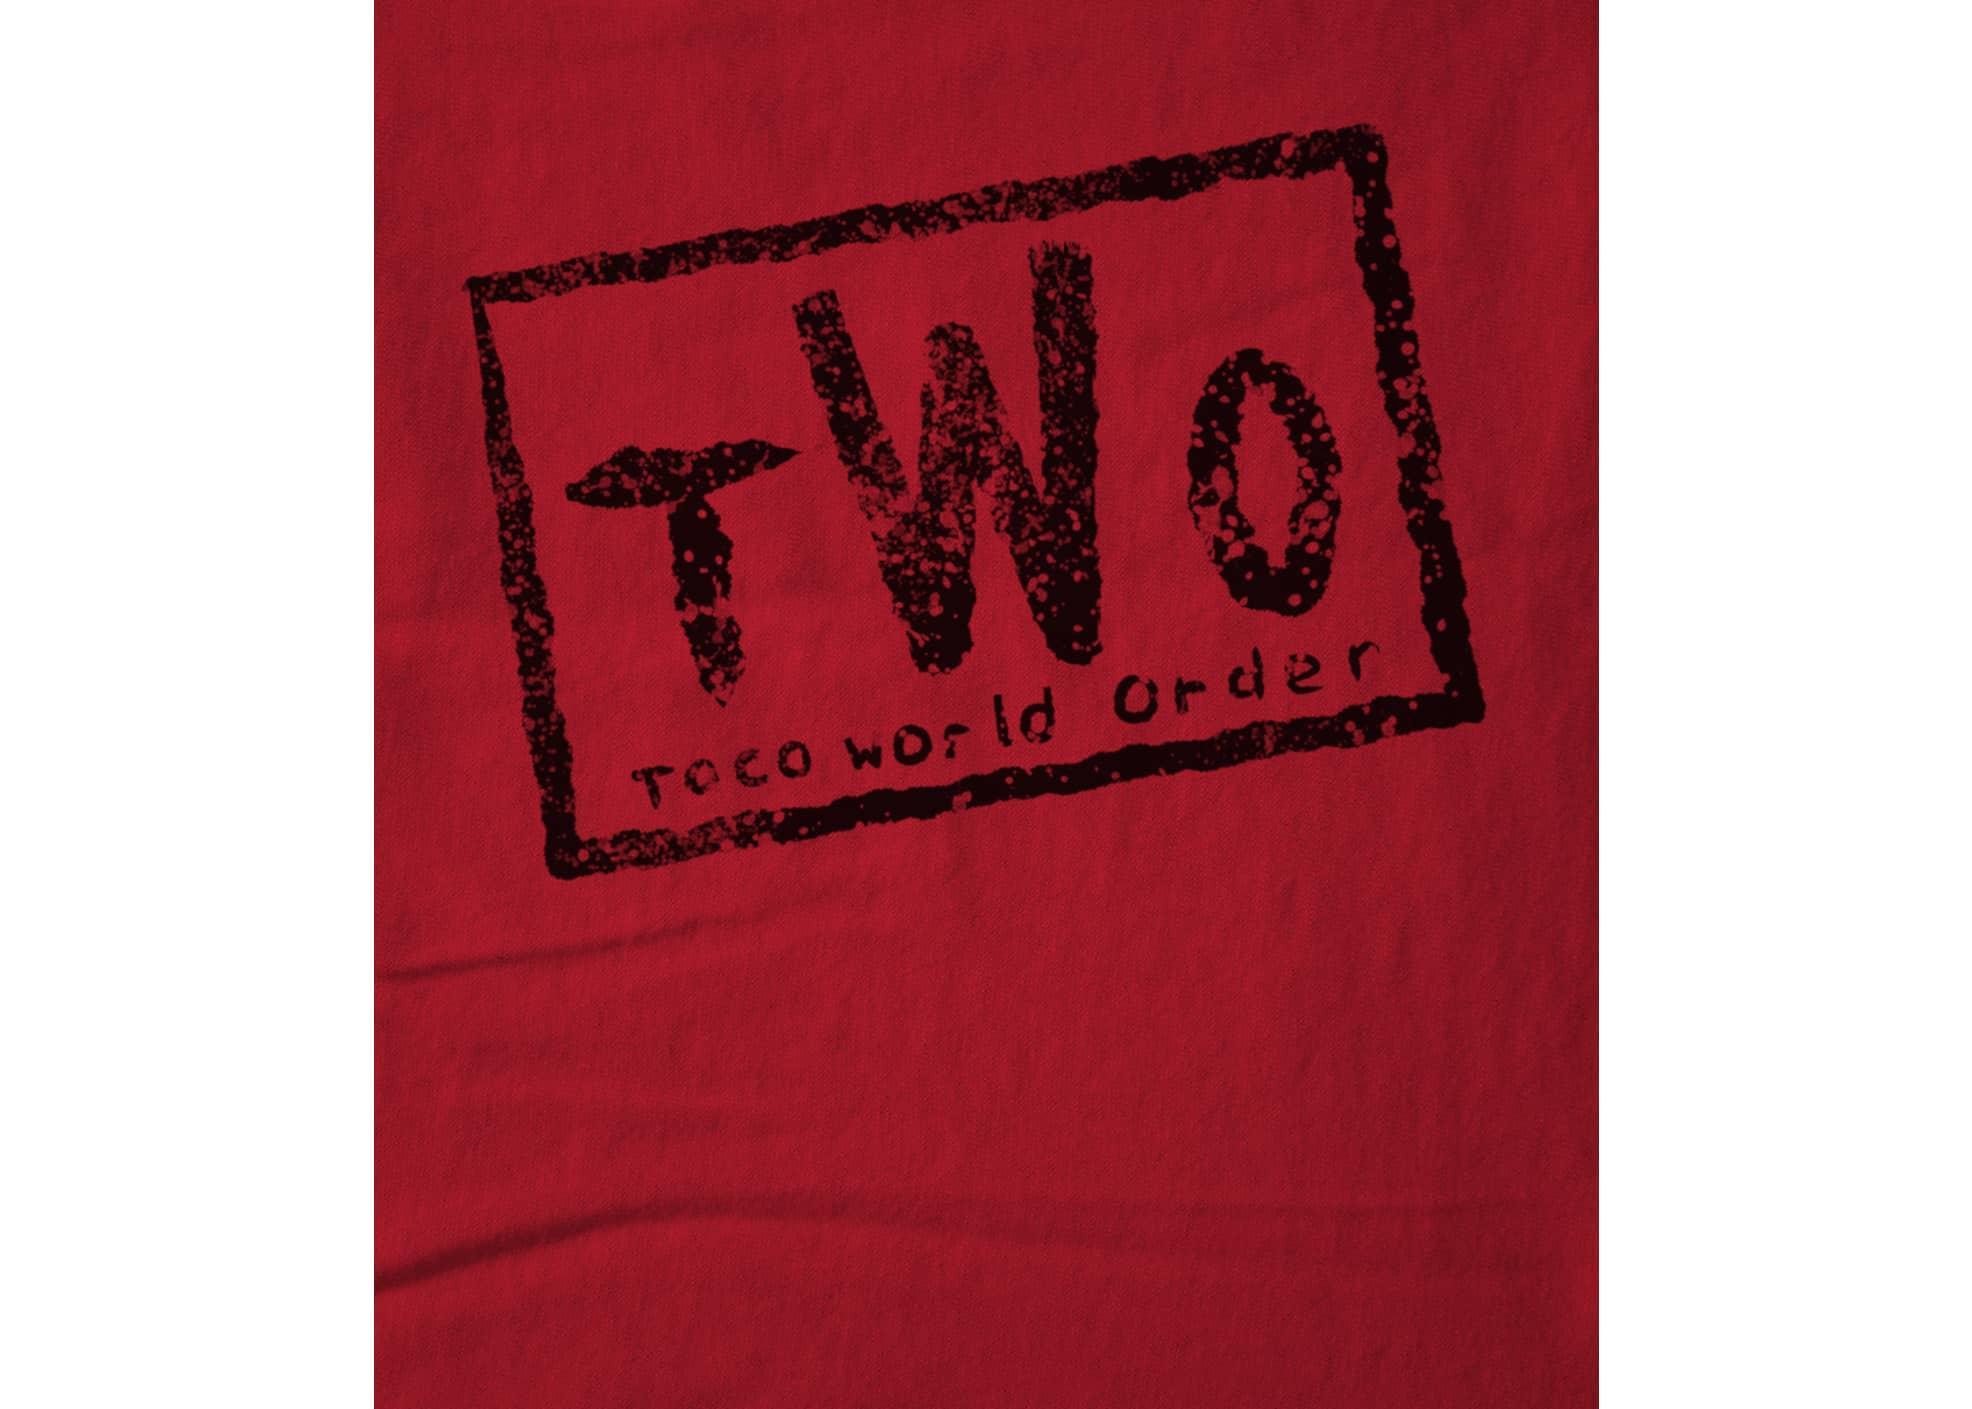 Tacostabber taco world order 1616391160